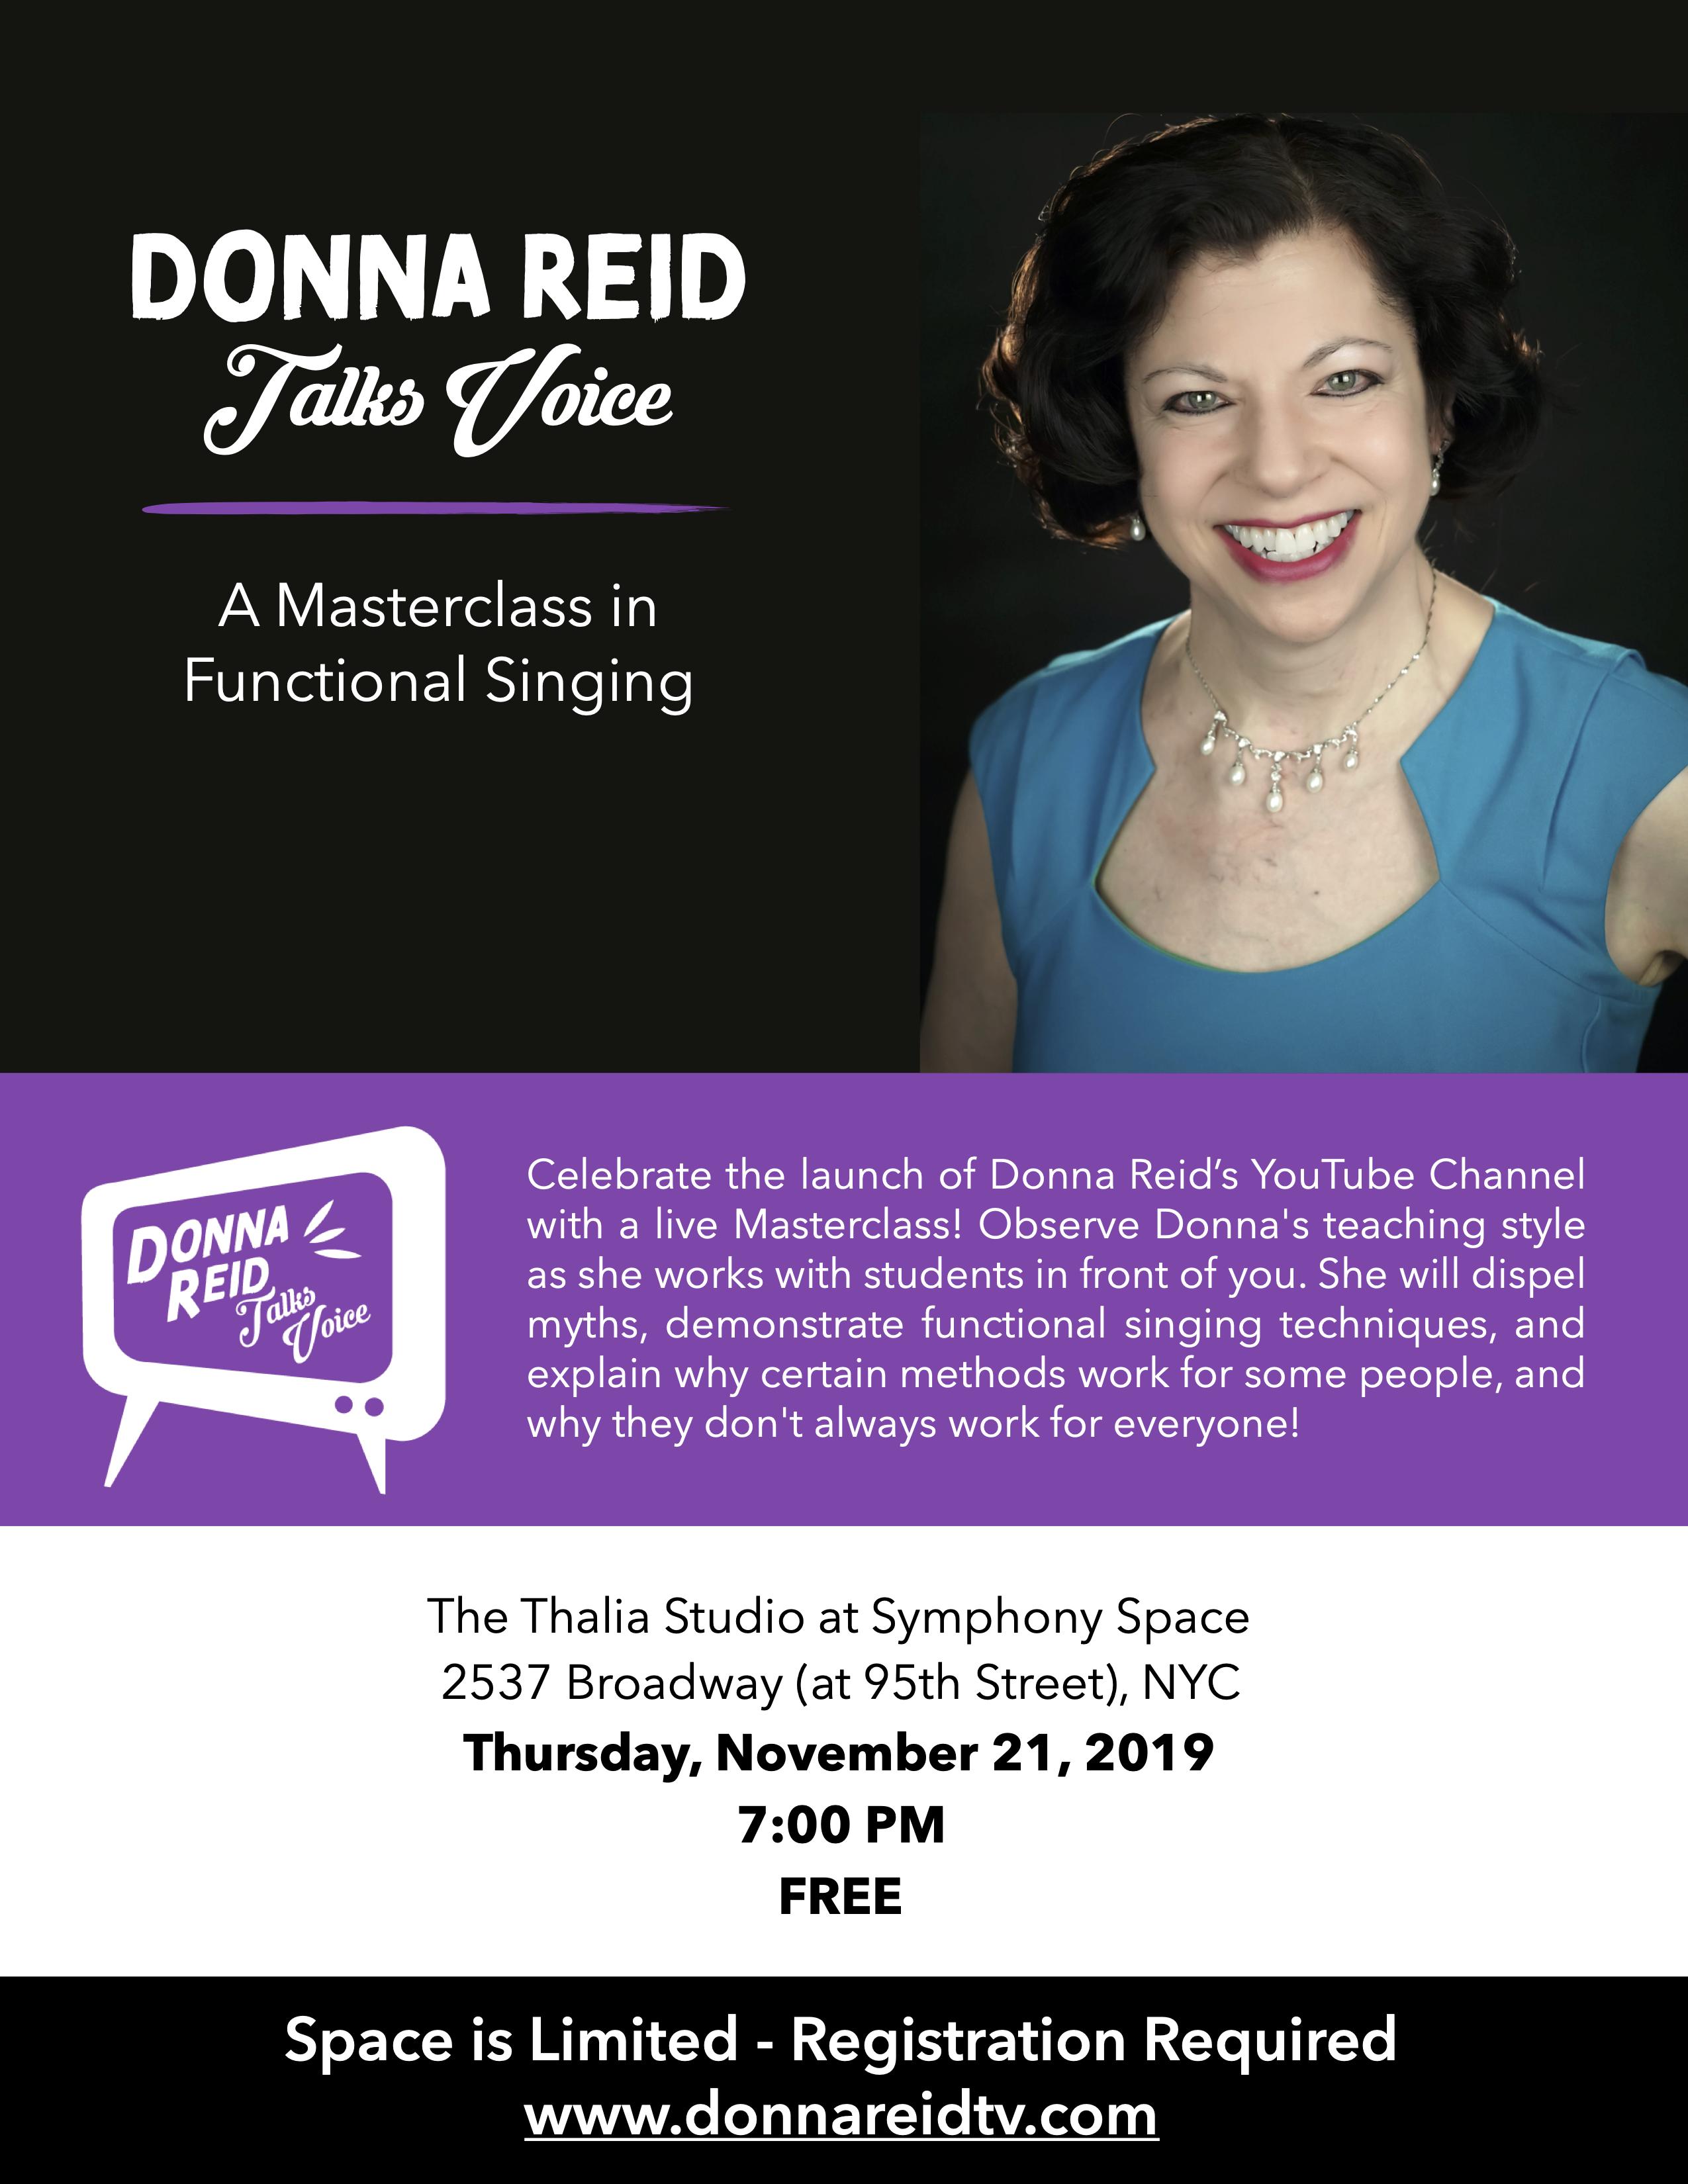 Donna Reid TV Masterclass flyer jpg